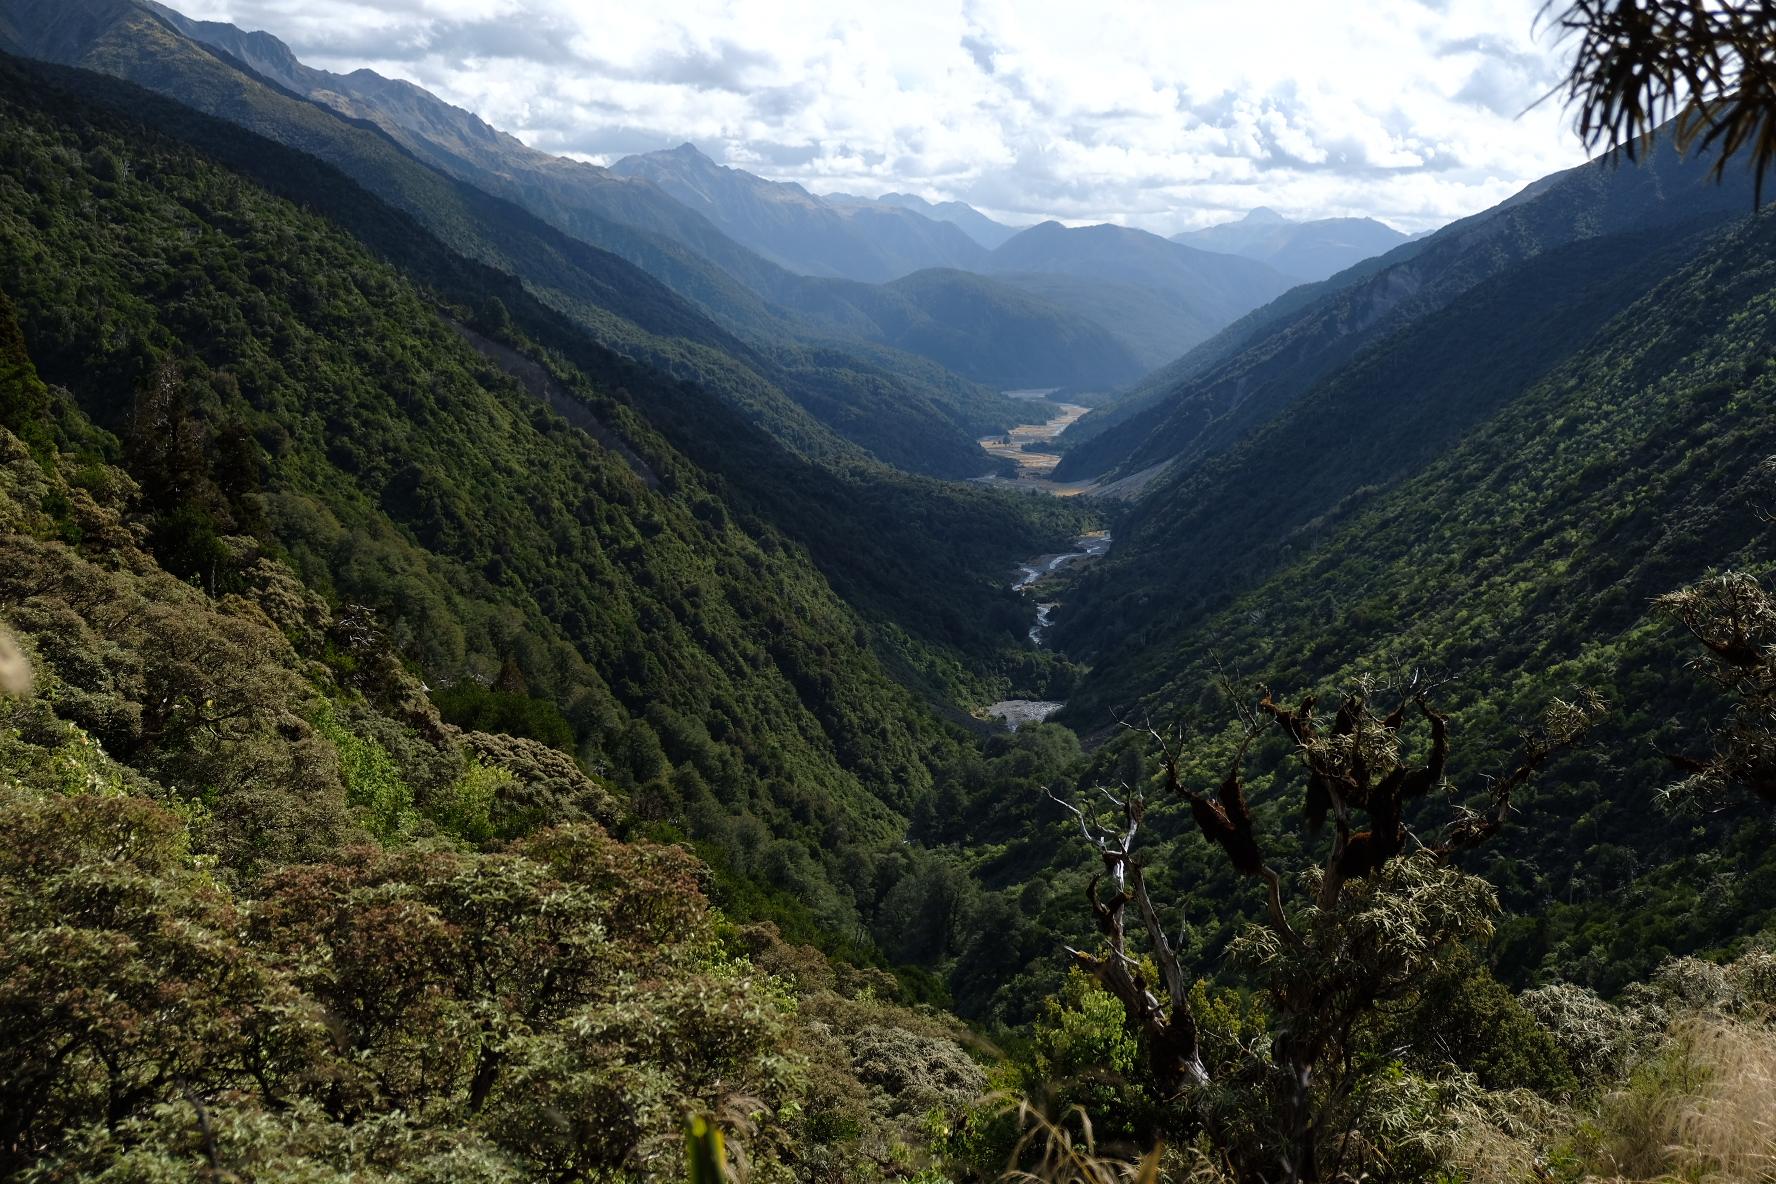 Gorgeous views down into the Taramakau valley